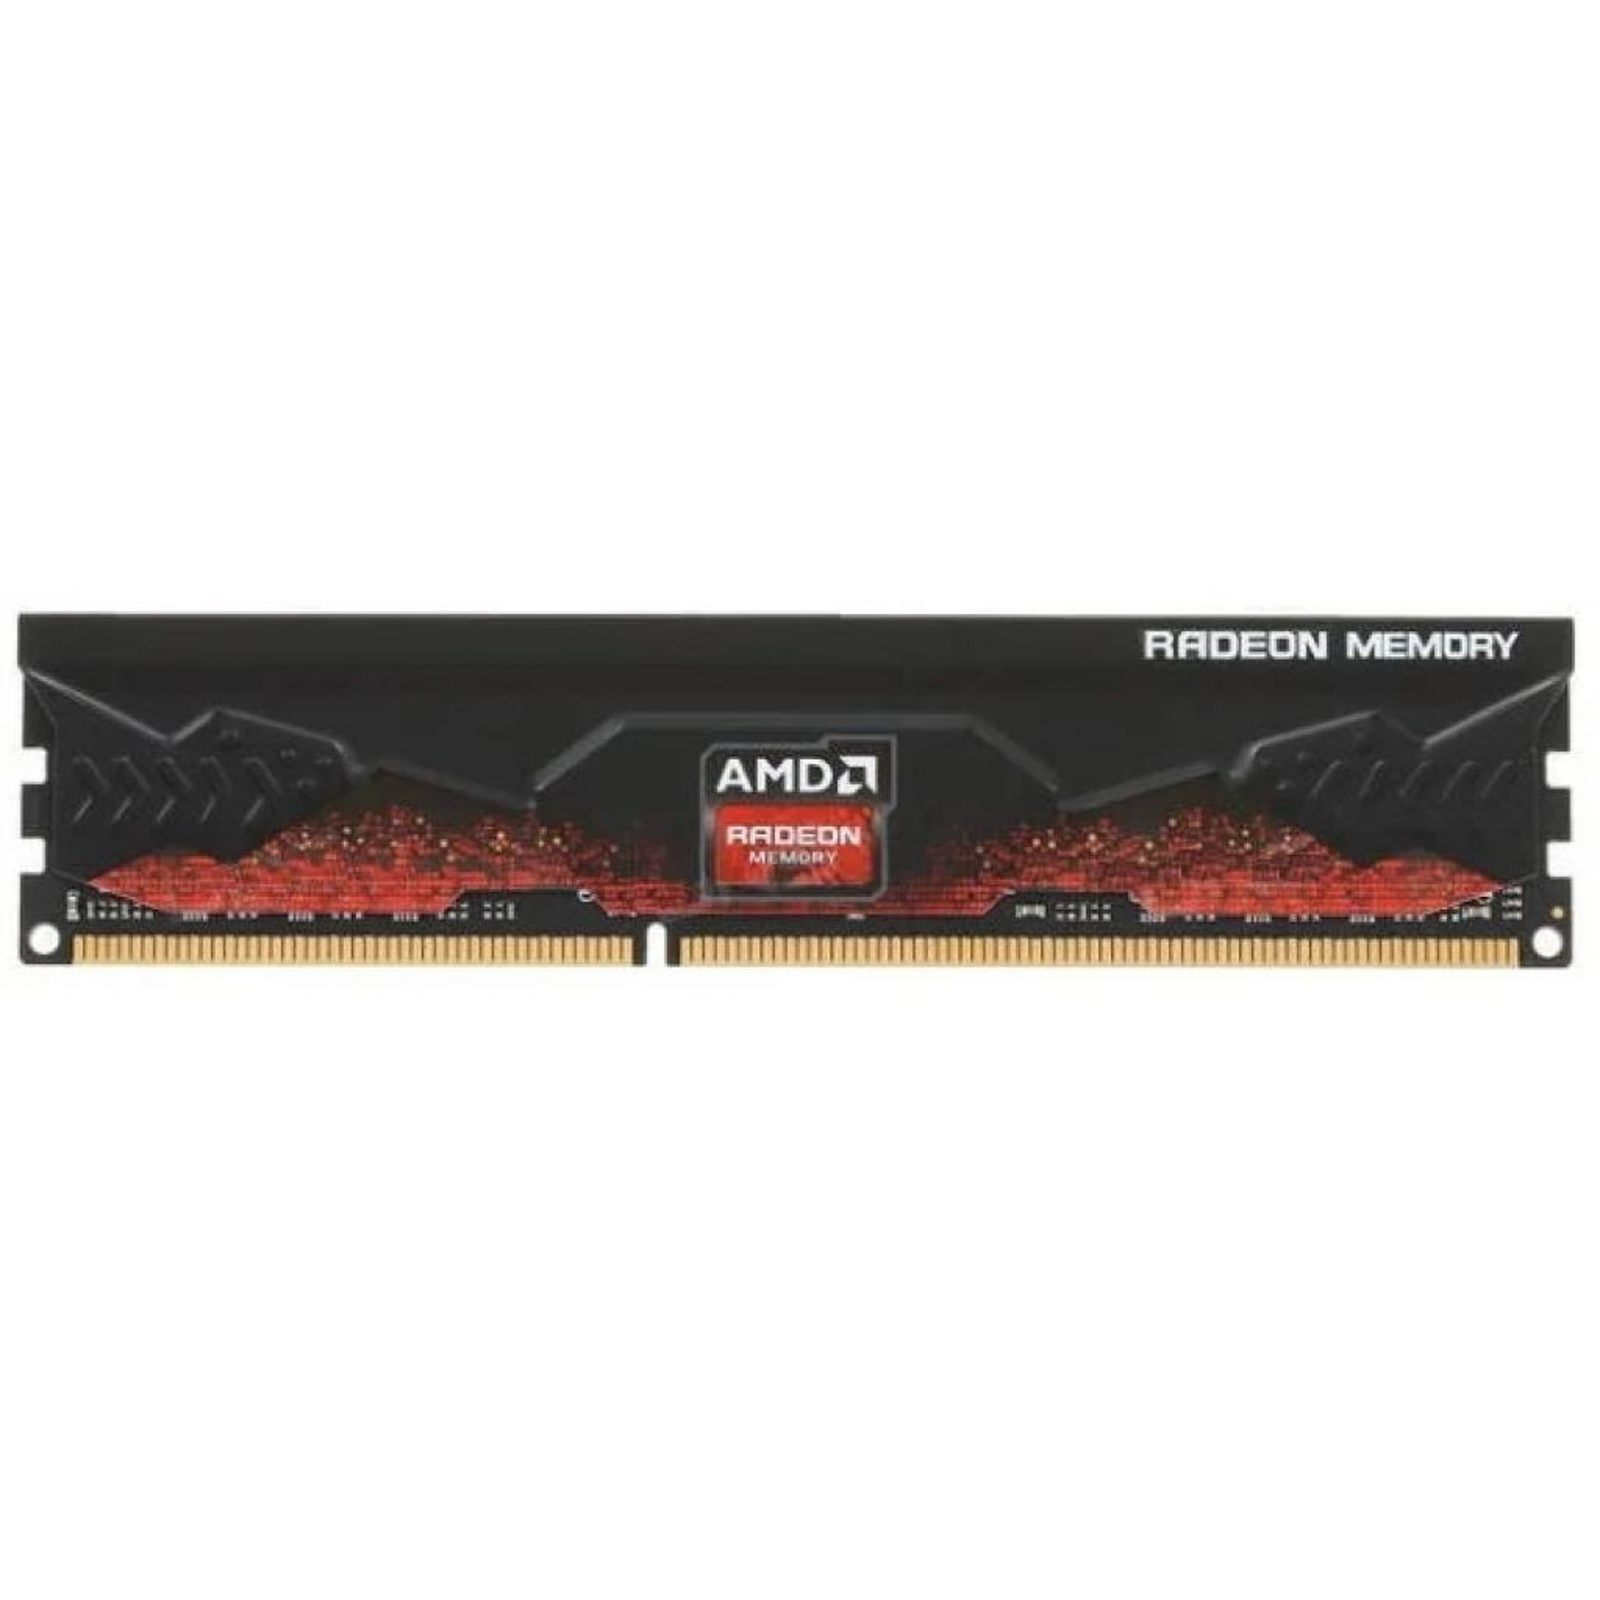 Модуль памяти для компьютера DDR4 16GB 3200 MHz Radeon R9 AMD (R9S416G3206U2S)